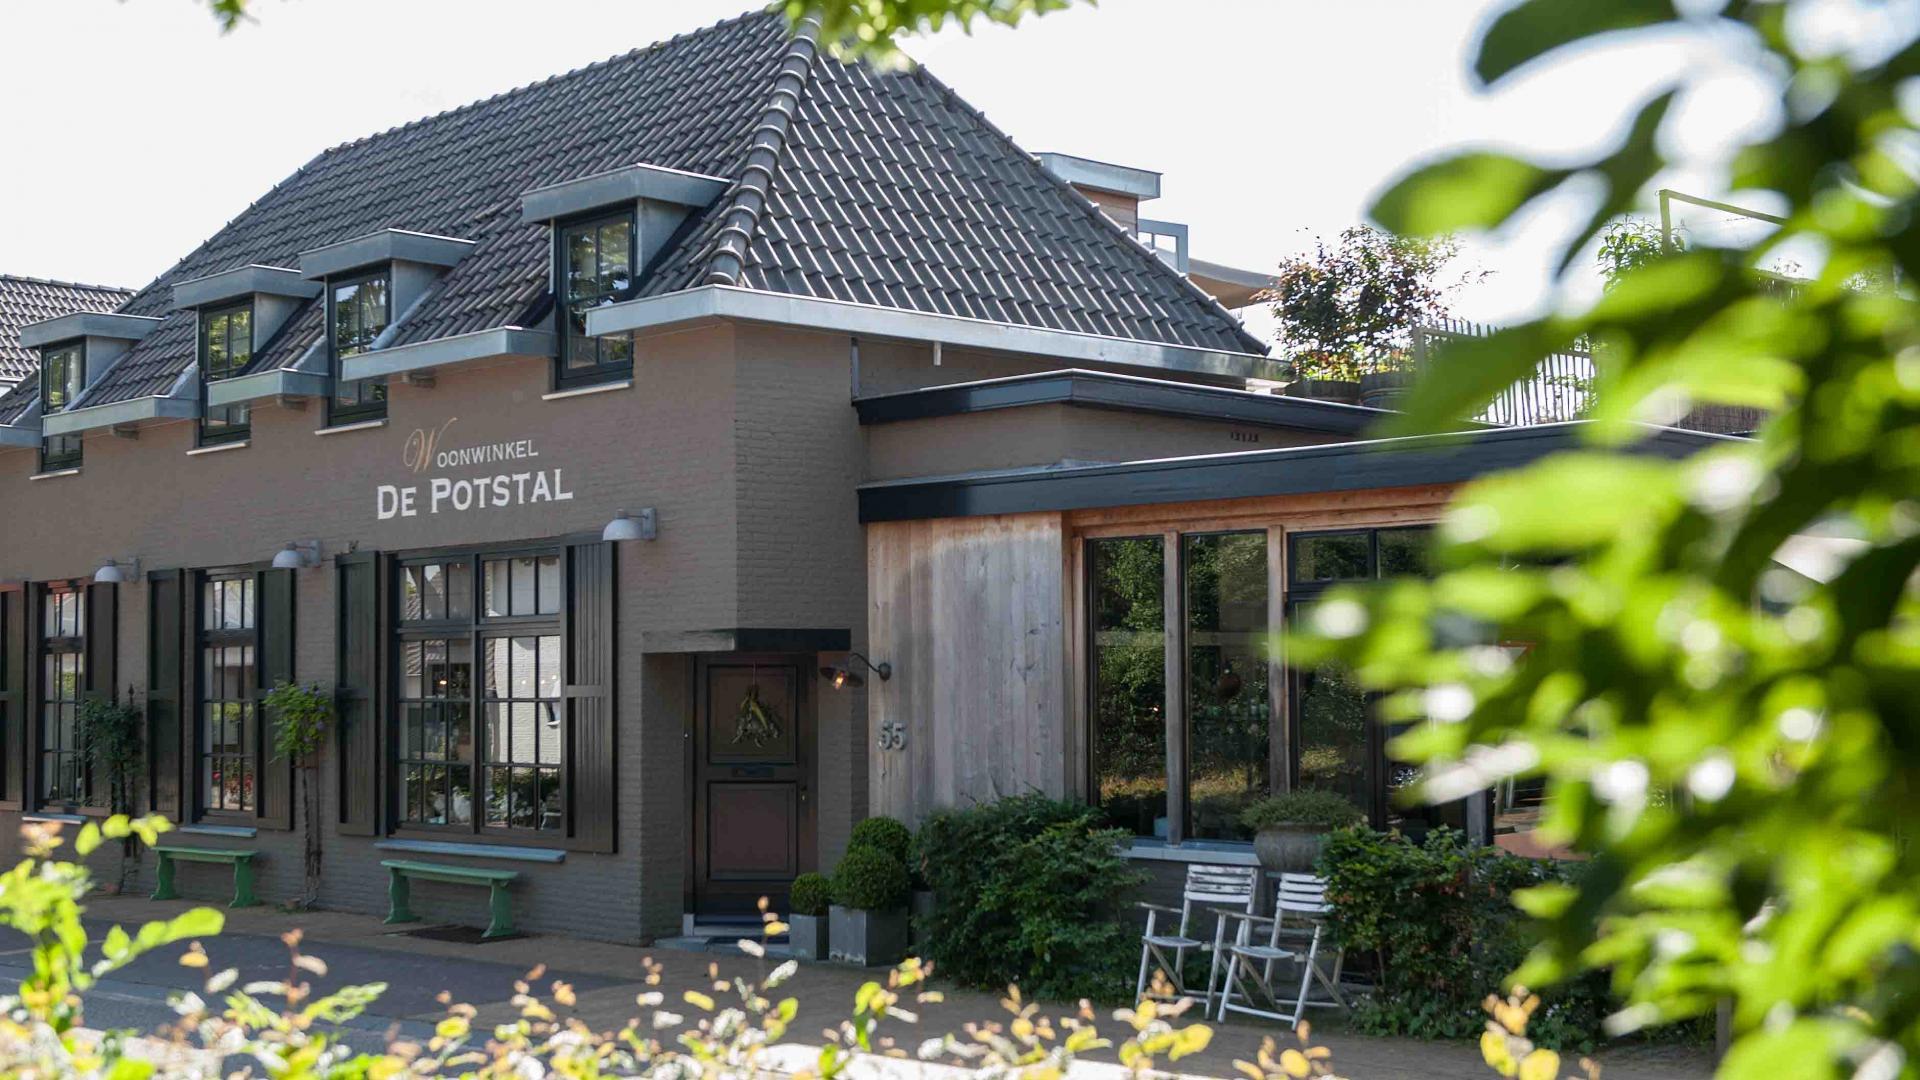 Woonwinkel de Potstal